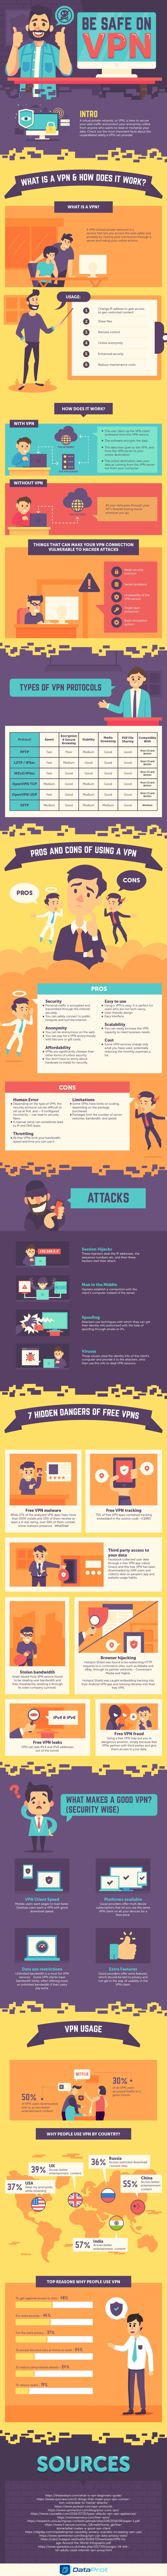 VPN_Infographic